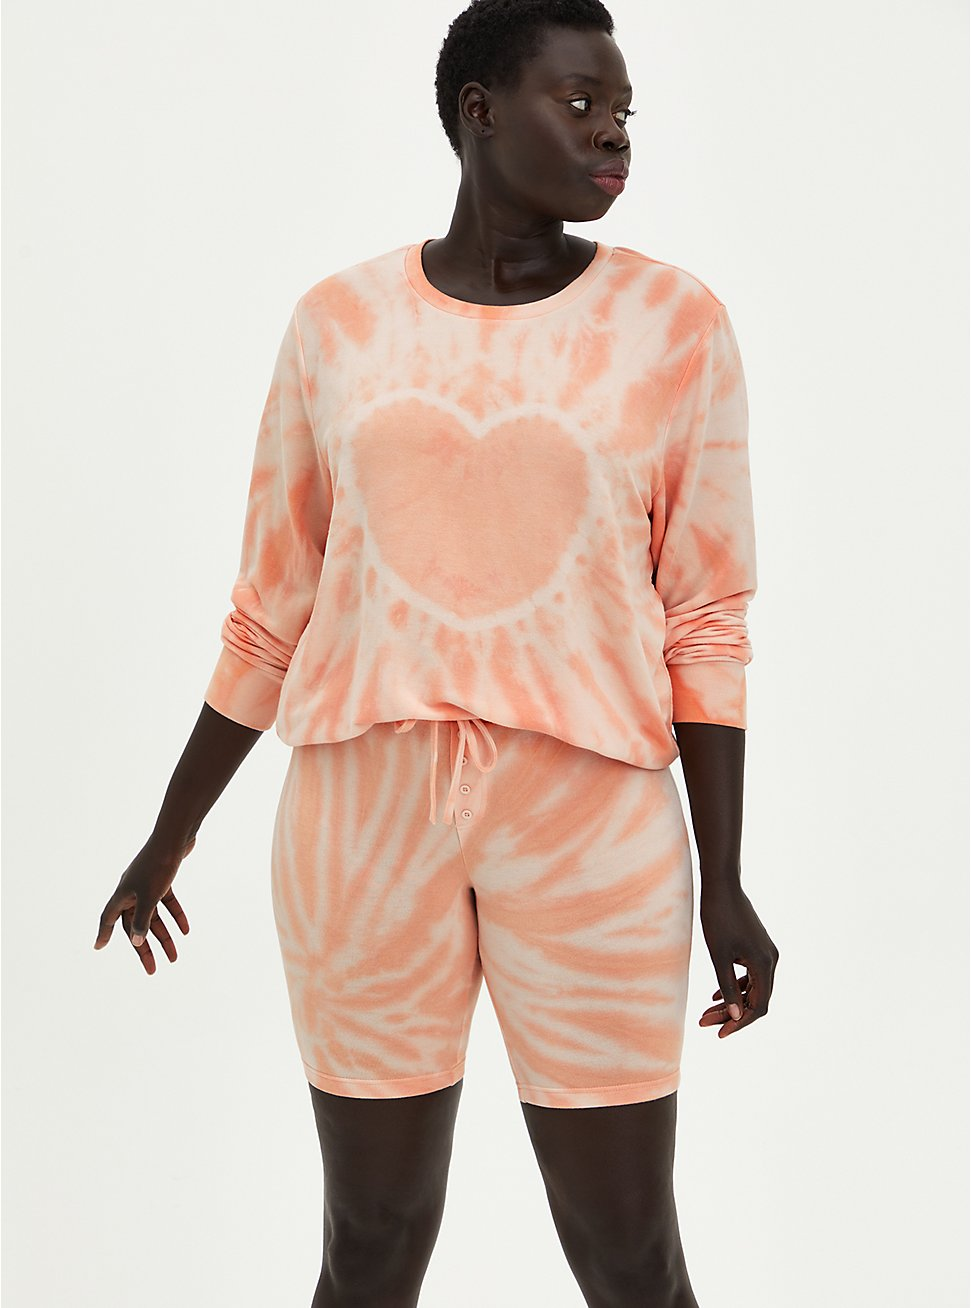 Plus Size Sleep Sweatshirt - Micro Modal Terry Tie-Dye Peach, MULTI, hi-res